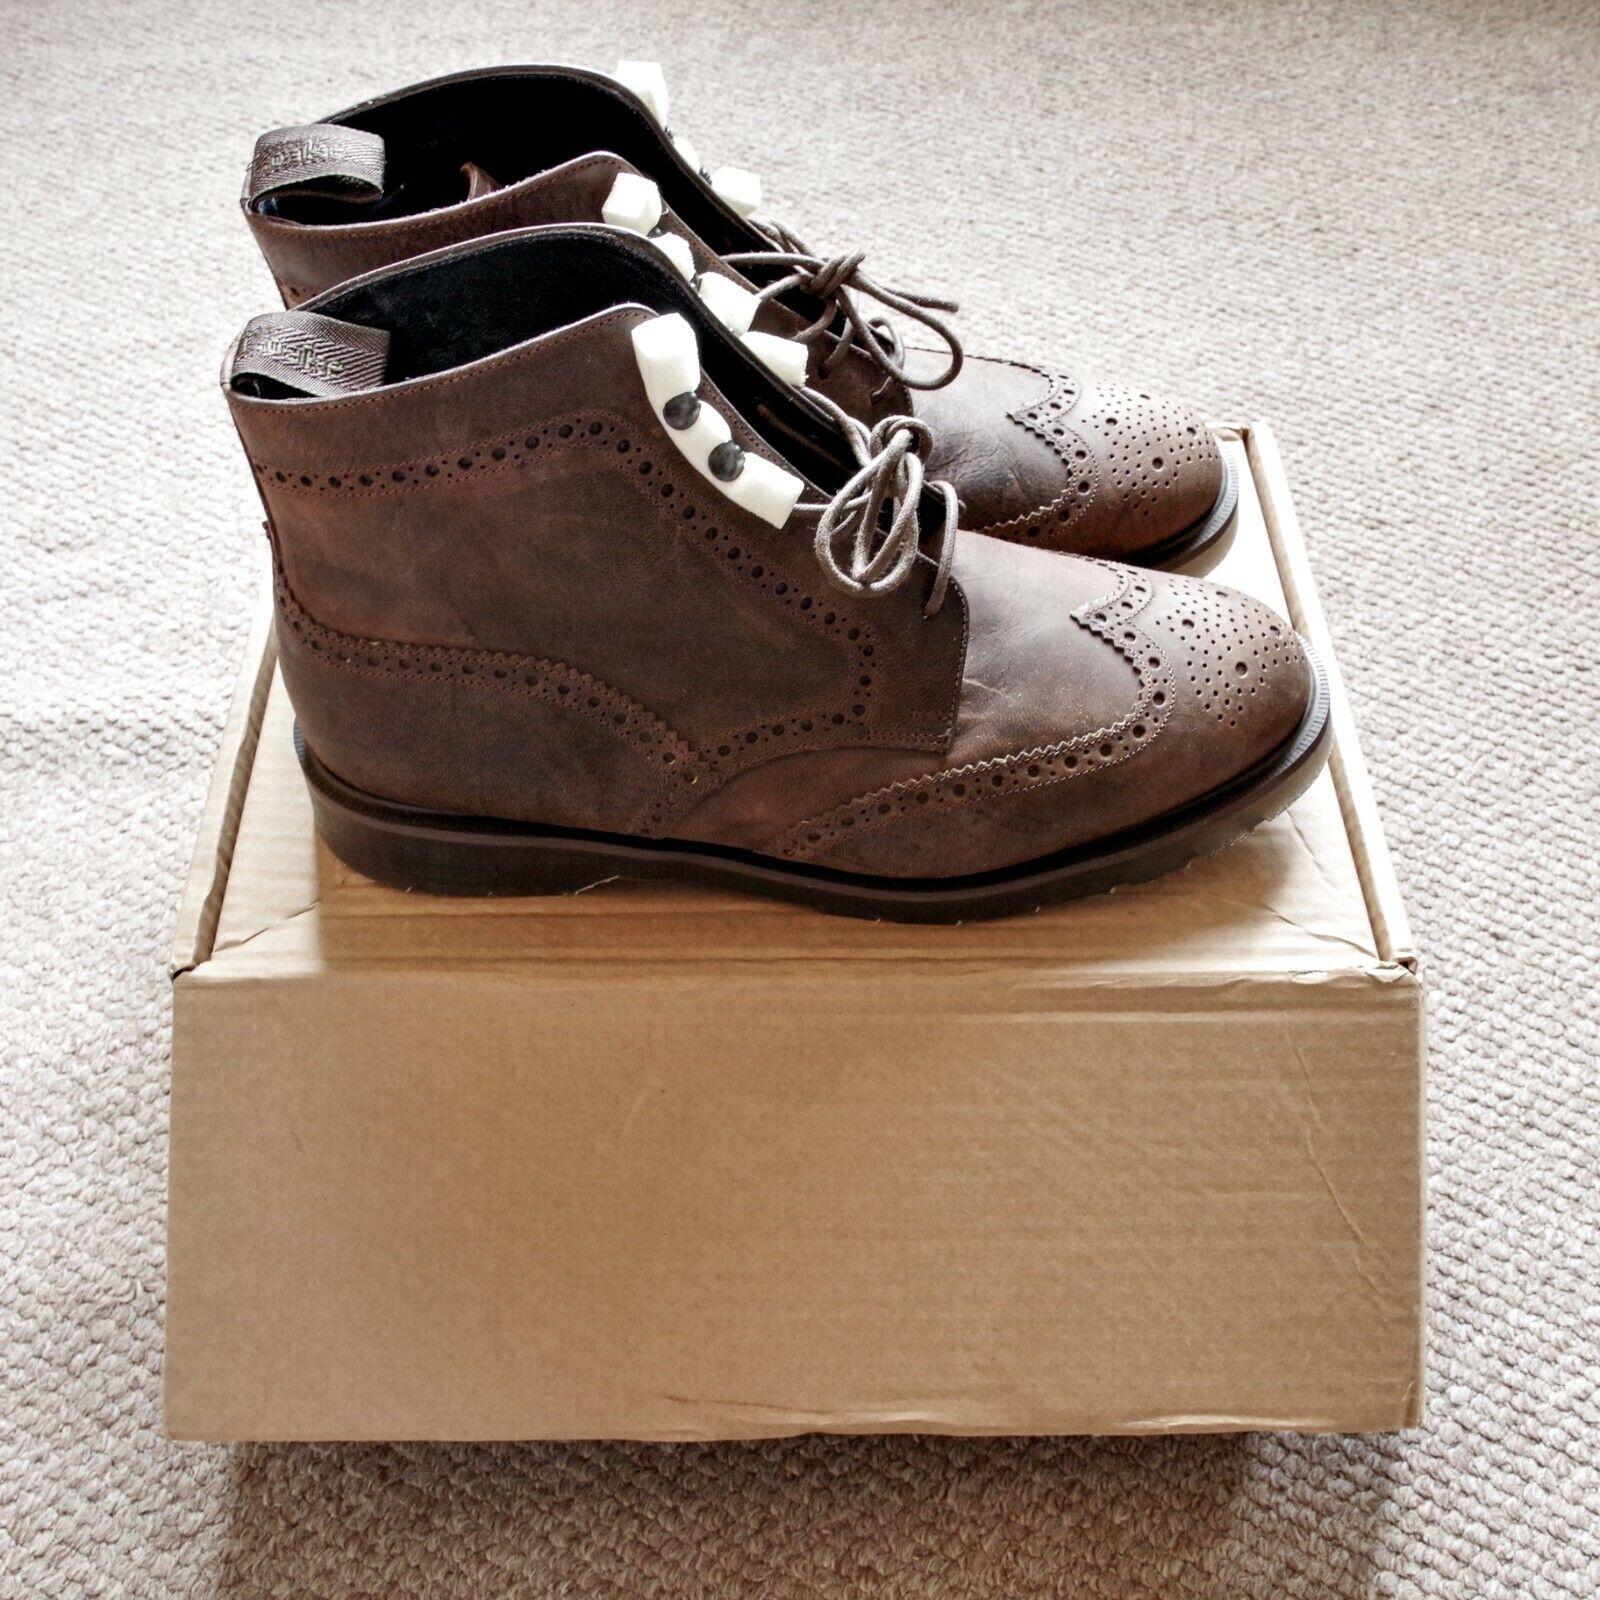 Loake NPS Solovair Rimmer Brogue Boots 10